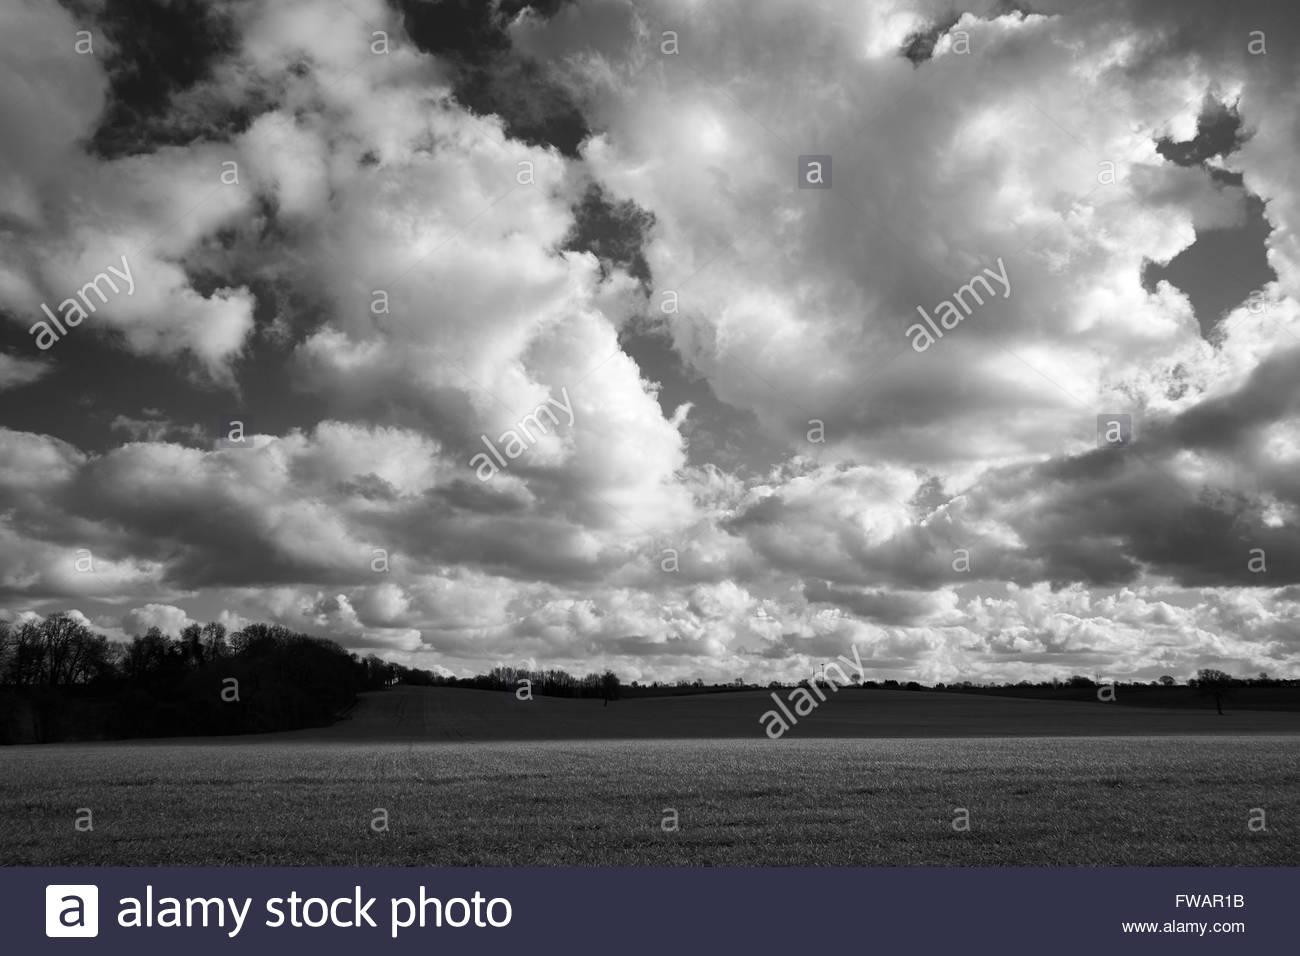 Storm clouds gathering over agricultural land. Bedfordshire, UK. - Stock Image